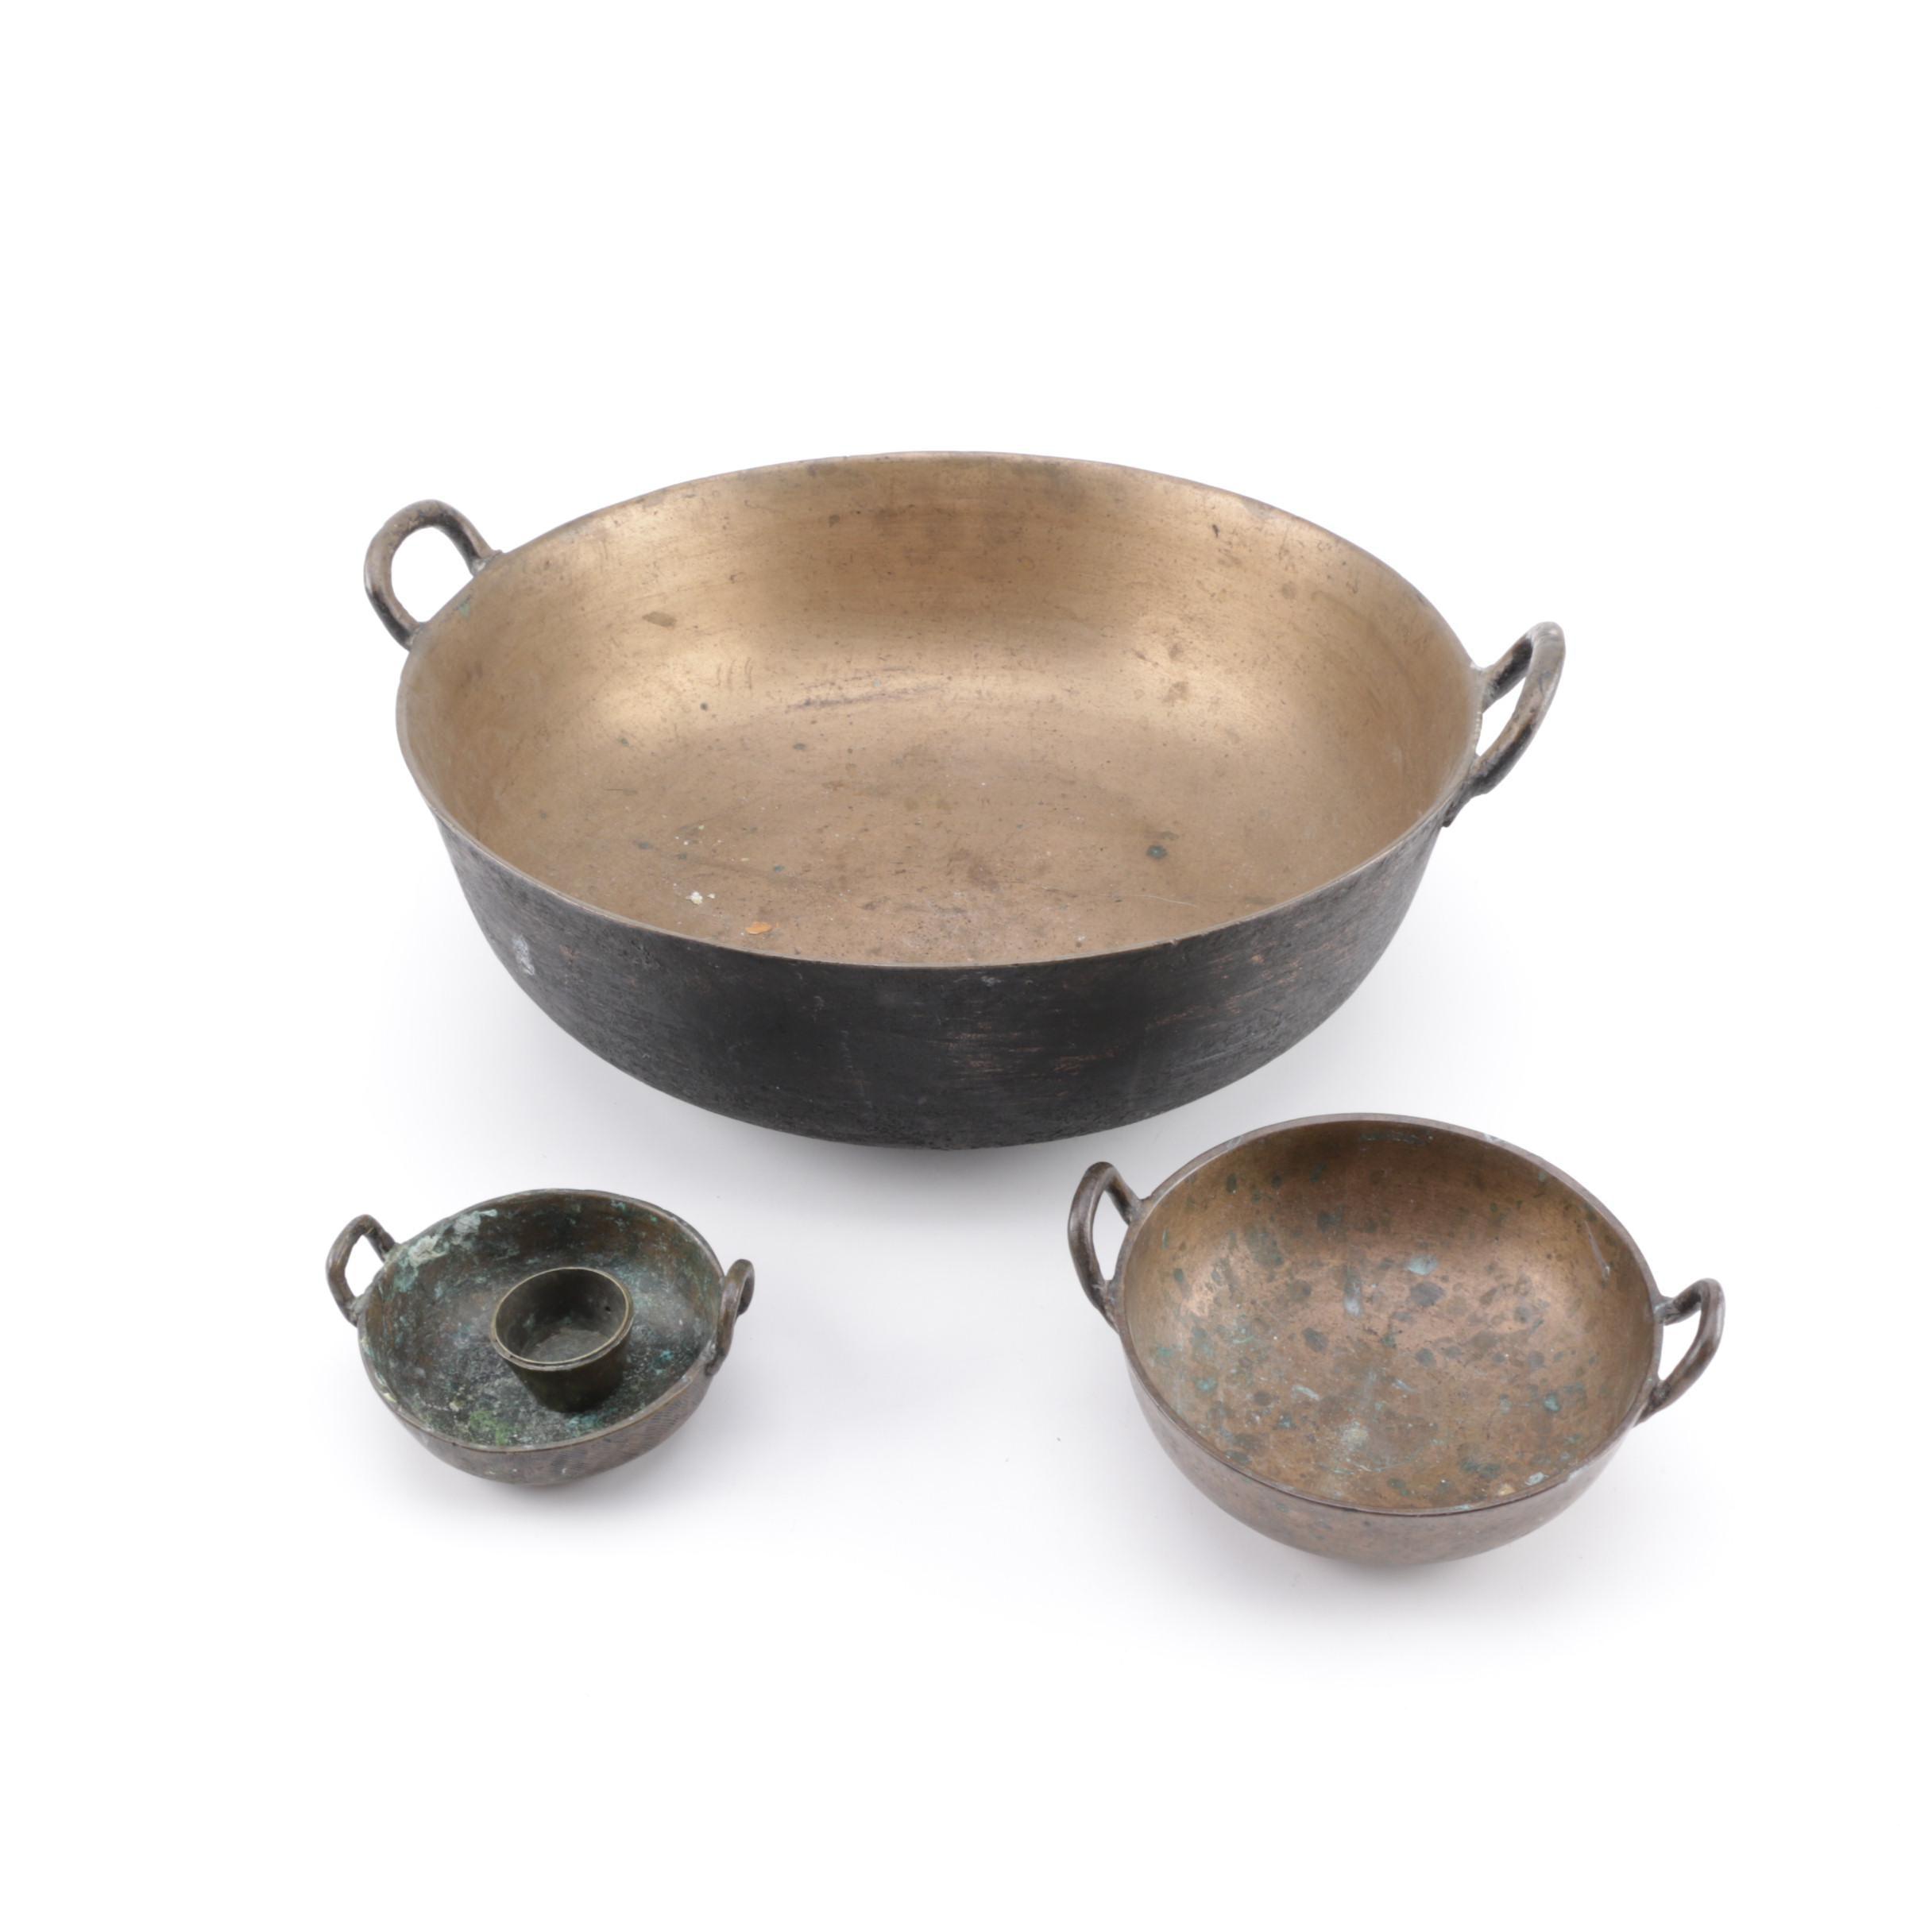 Vintage Metal Cookware